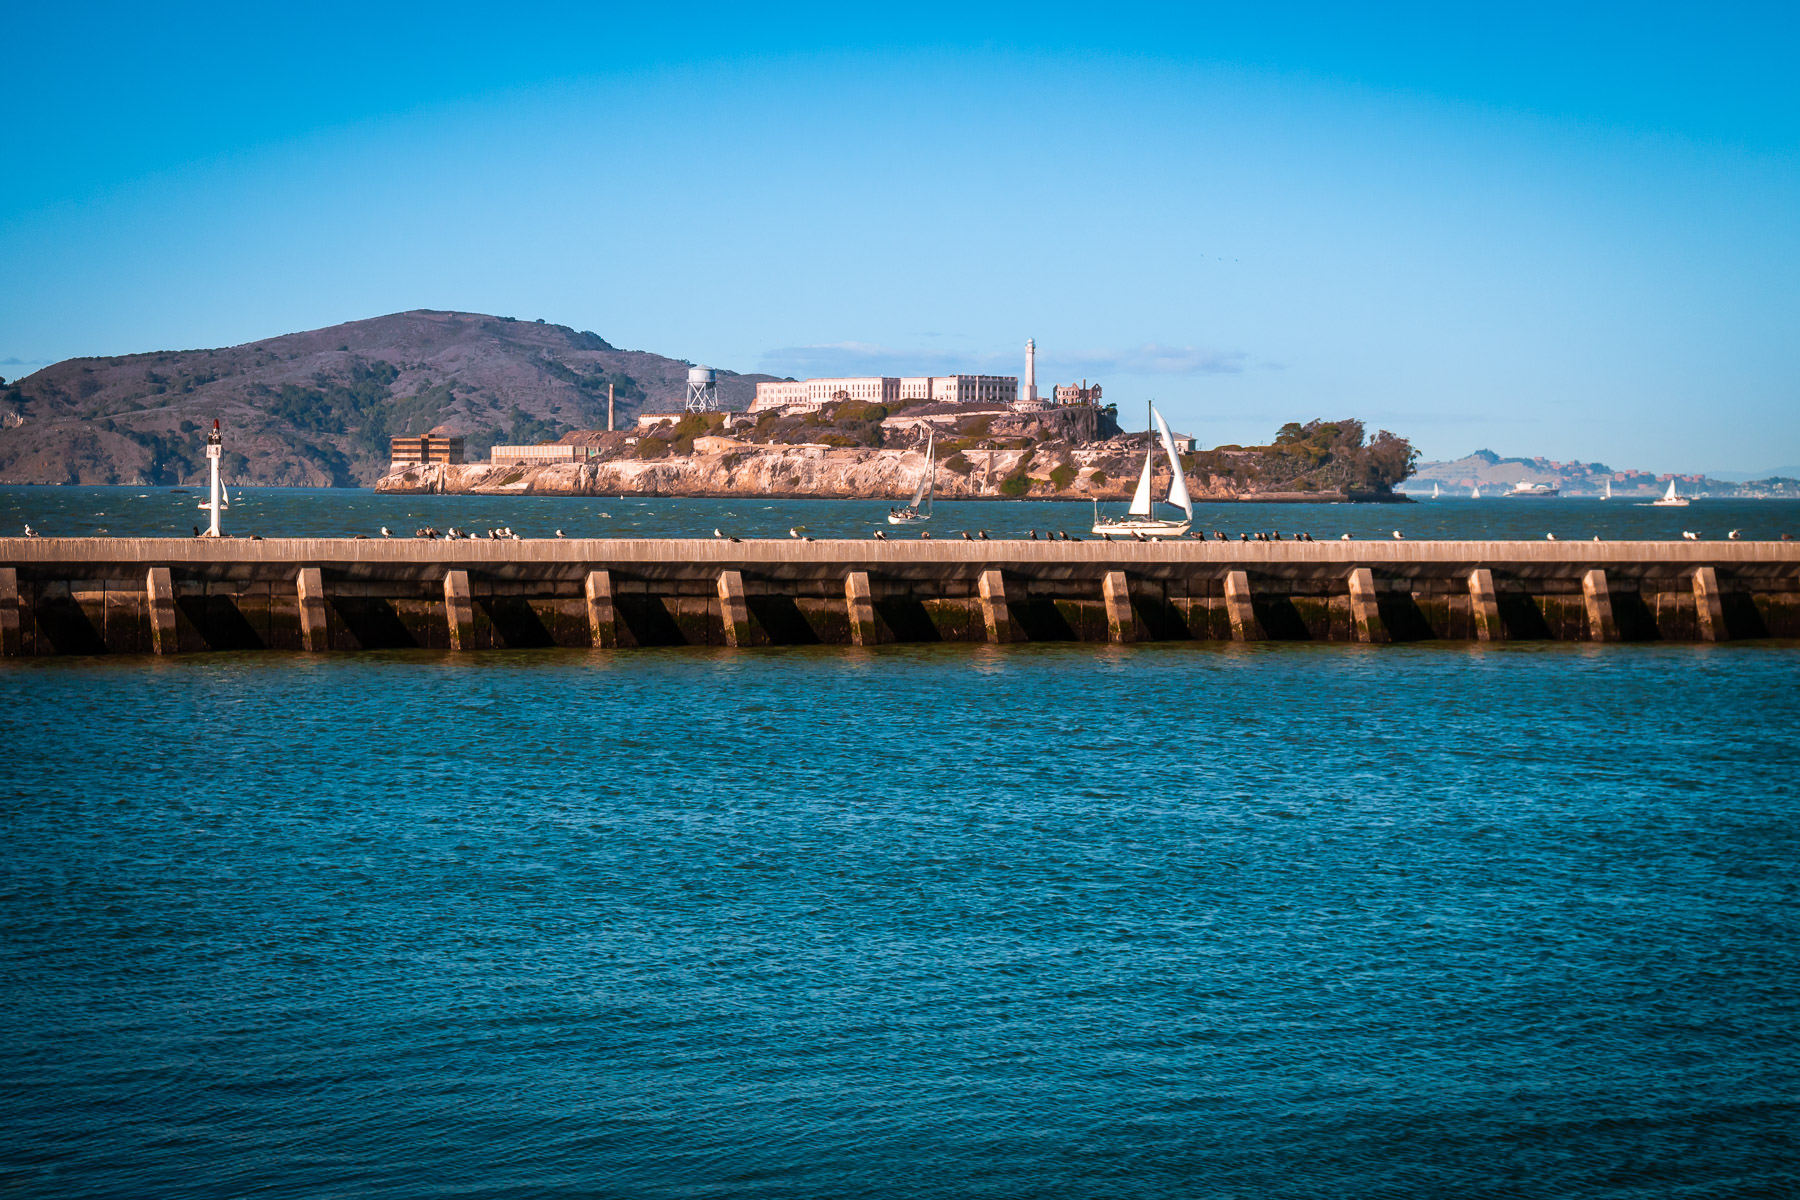 Alcatraz Island as seen from San Francisco's Aquatic Park.